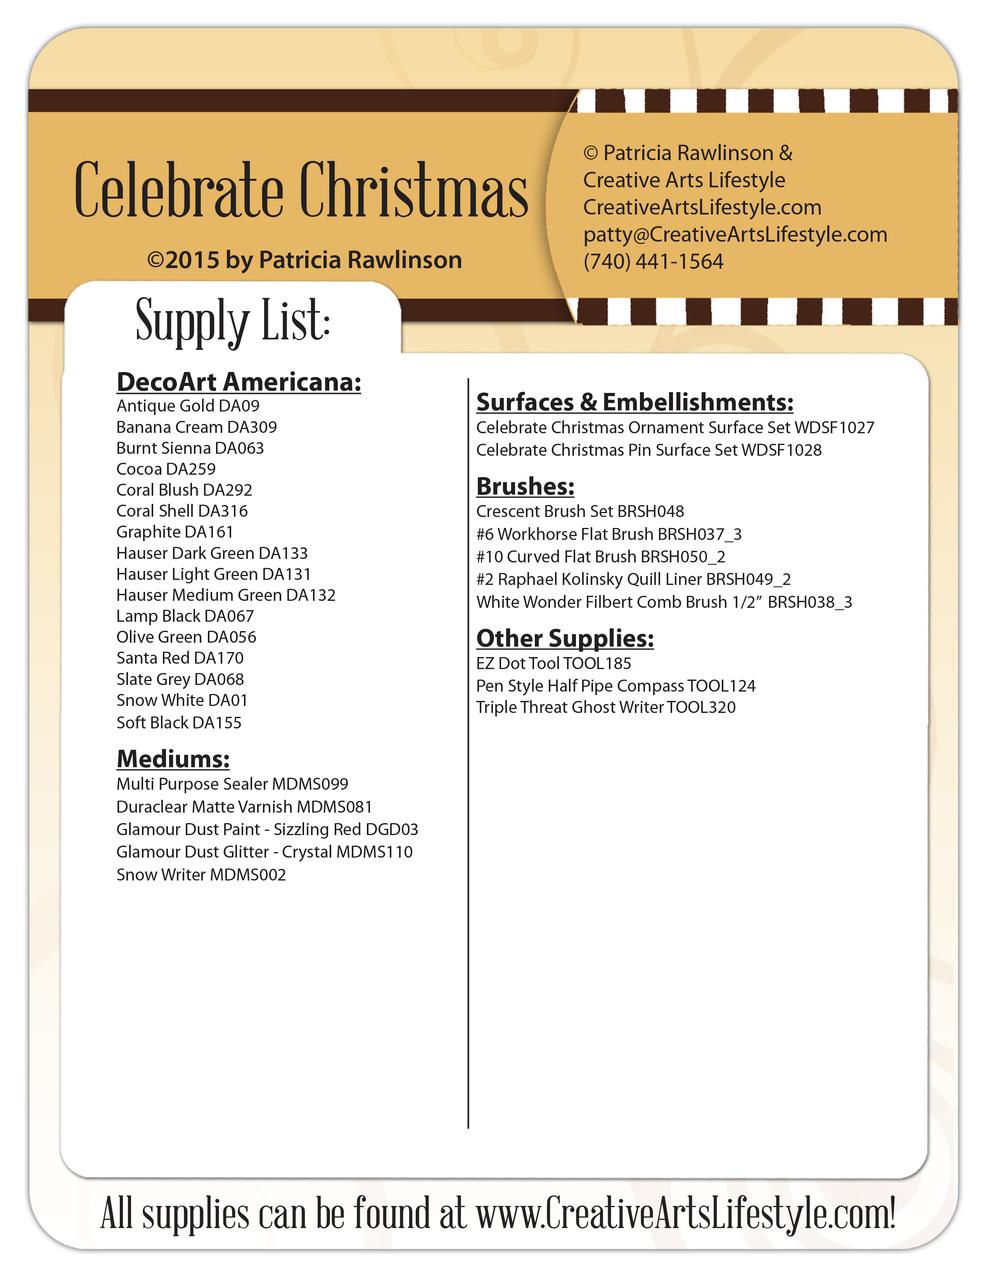 Celebrate Christmas DVD - Patricia Rawlinson